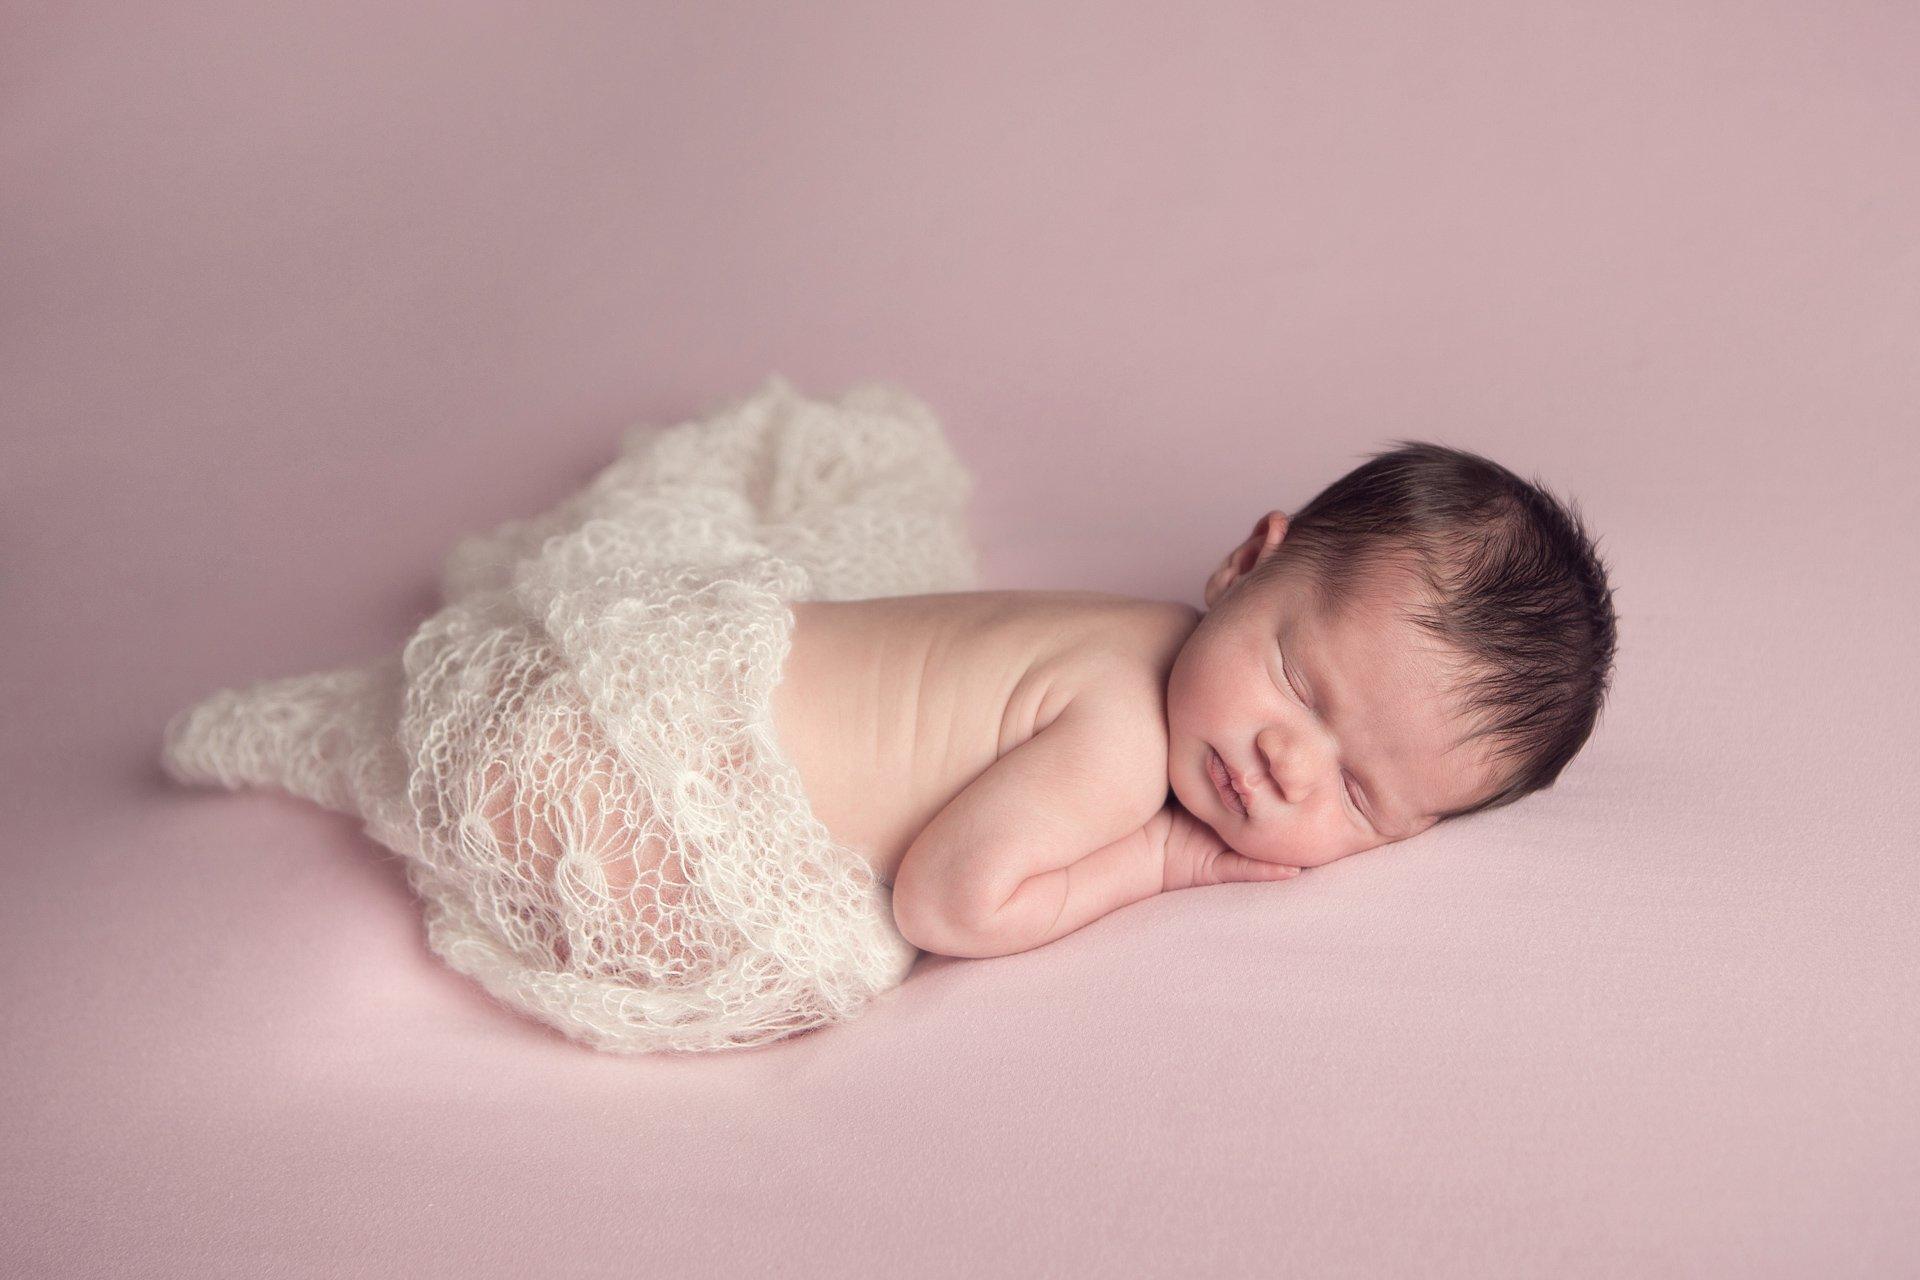 Newborn photography shropshire catherine evans photography